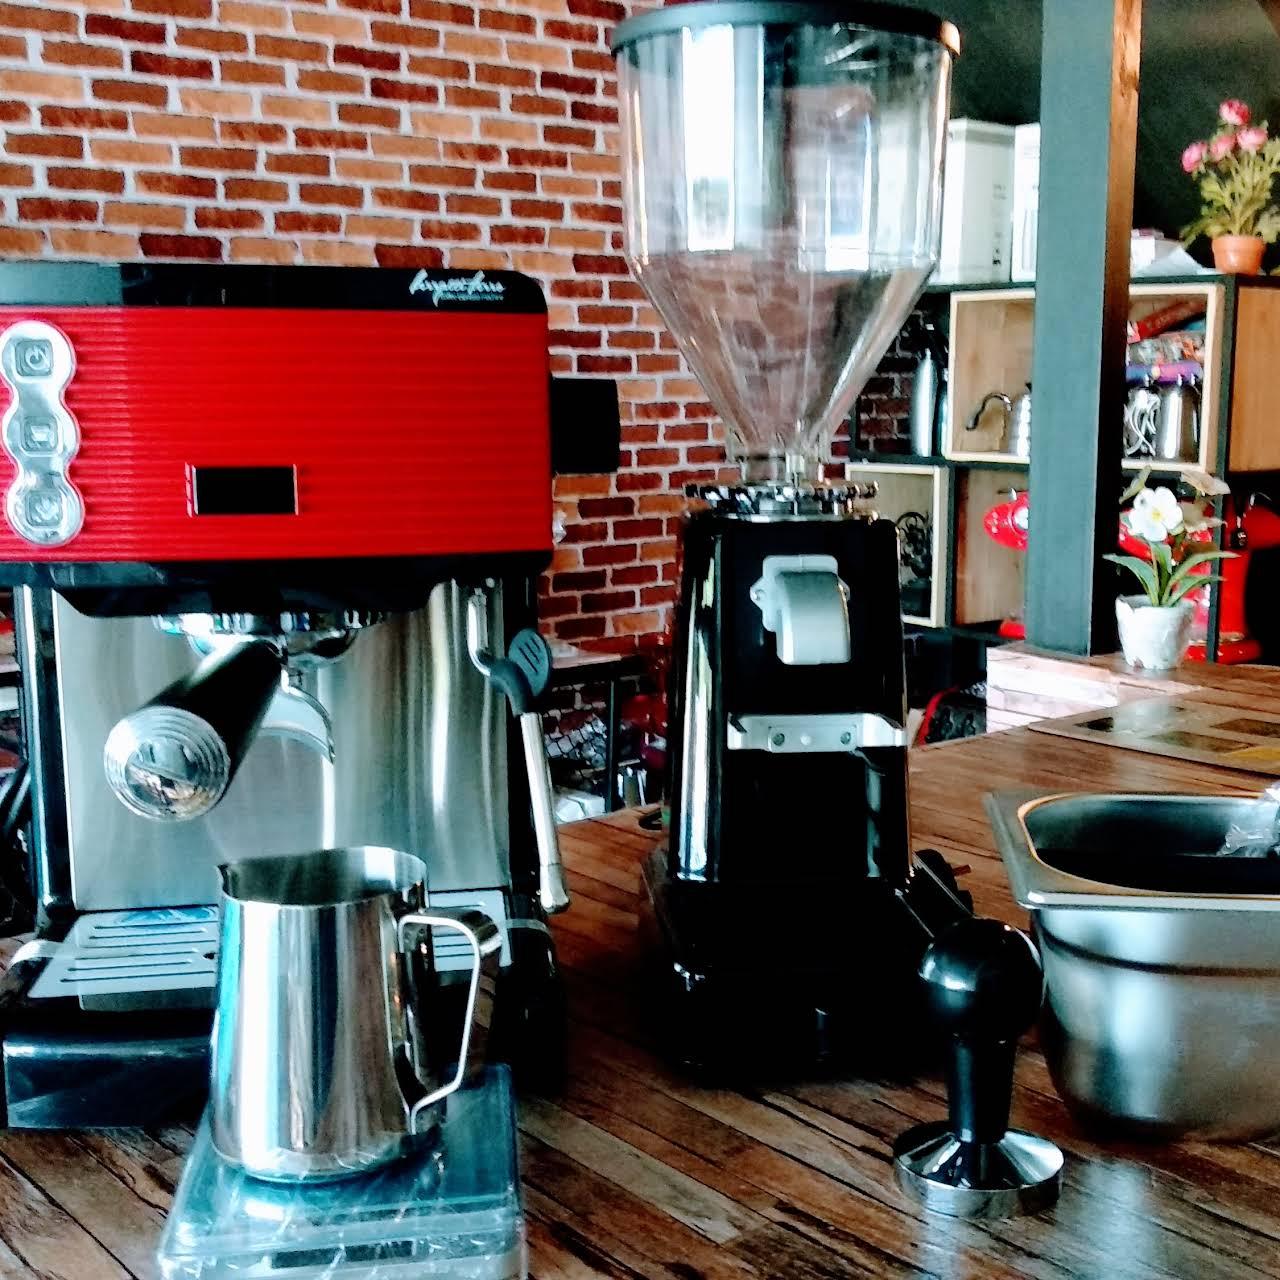 Peralatan Cafe Makassar Tongkonan Coffee Gallery Coffee Store Jual peralatan coffee shop